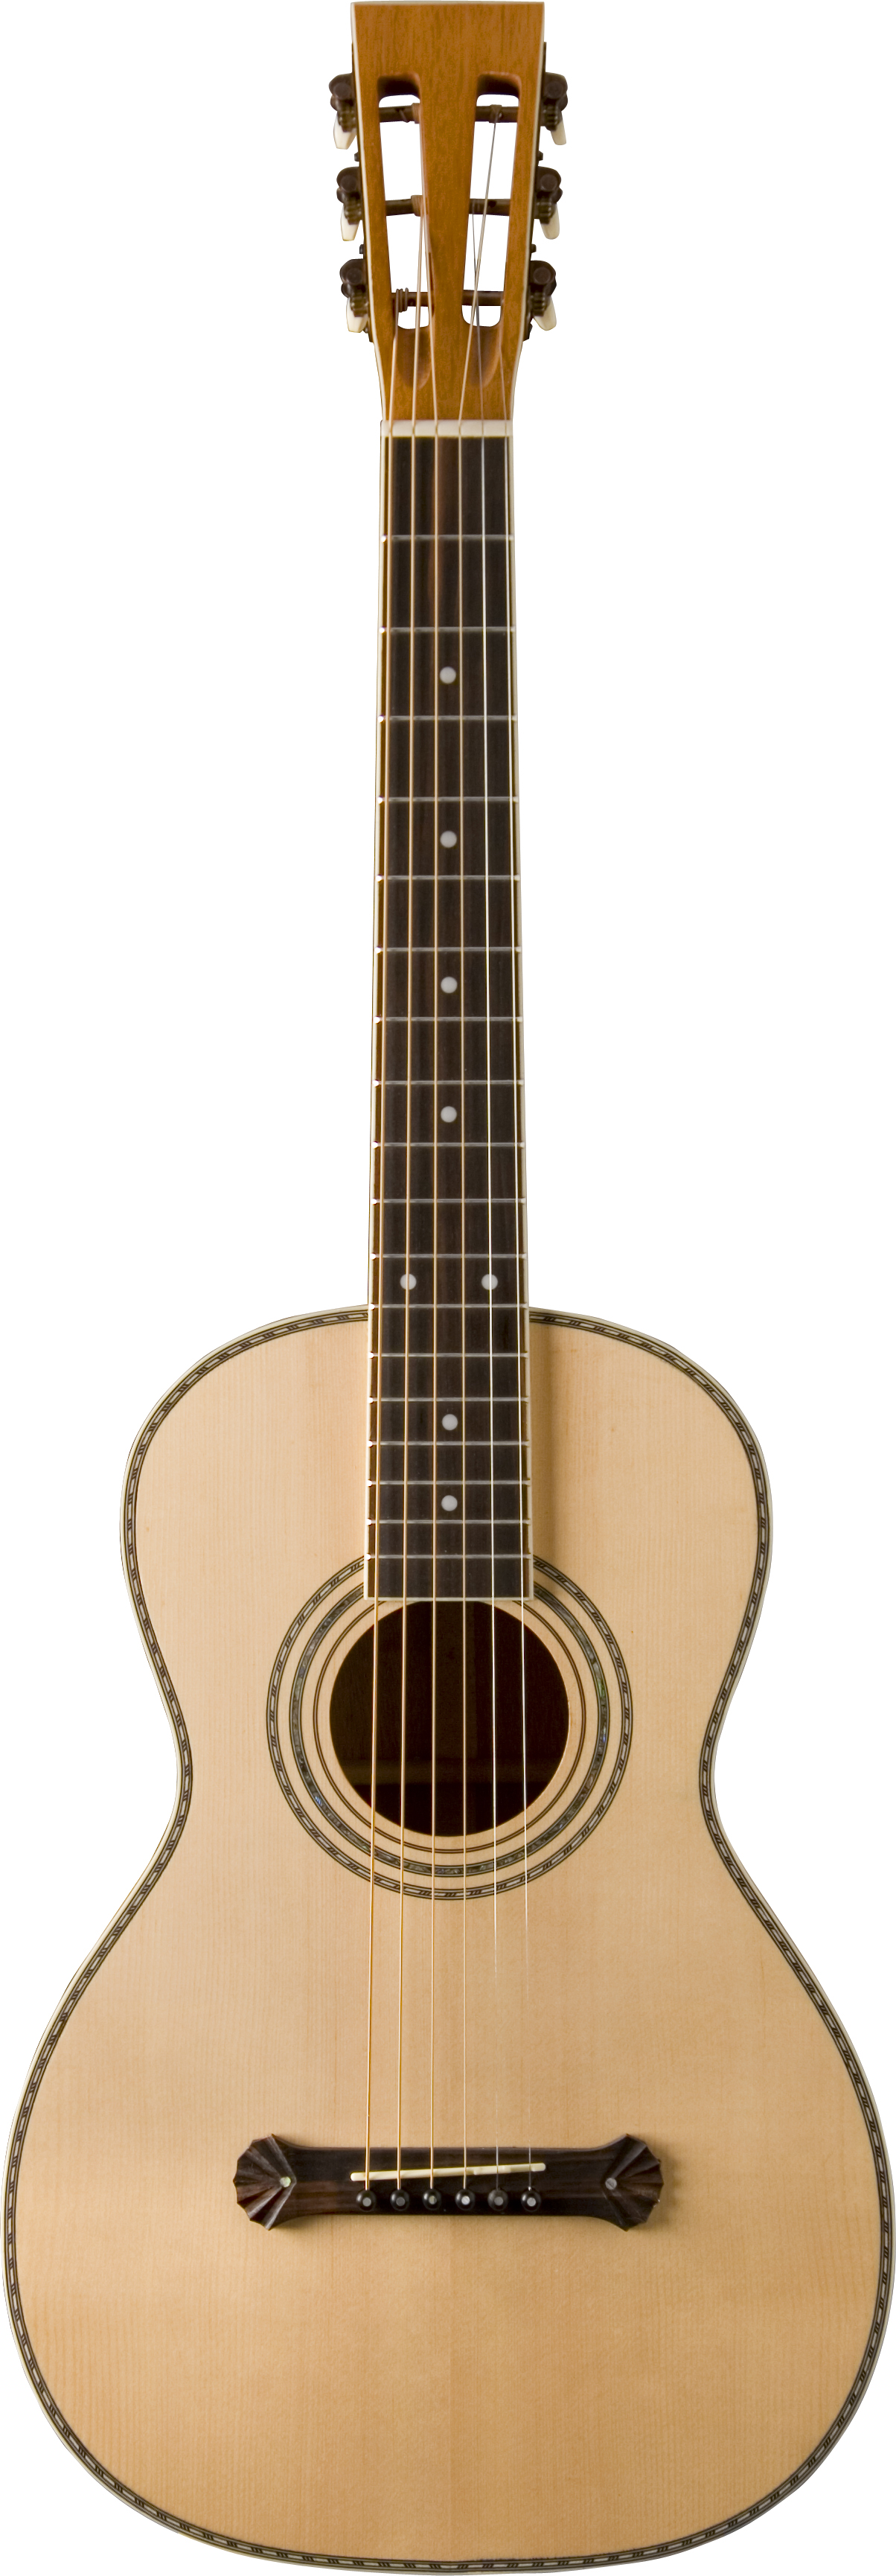 Oscar Schmidt O315 Parlor Size Acoustic Guitar by KMC Music